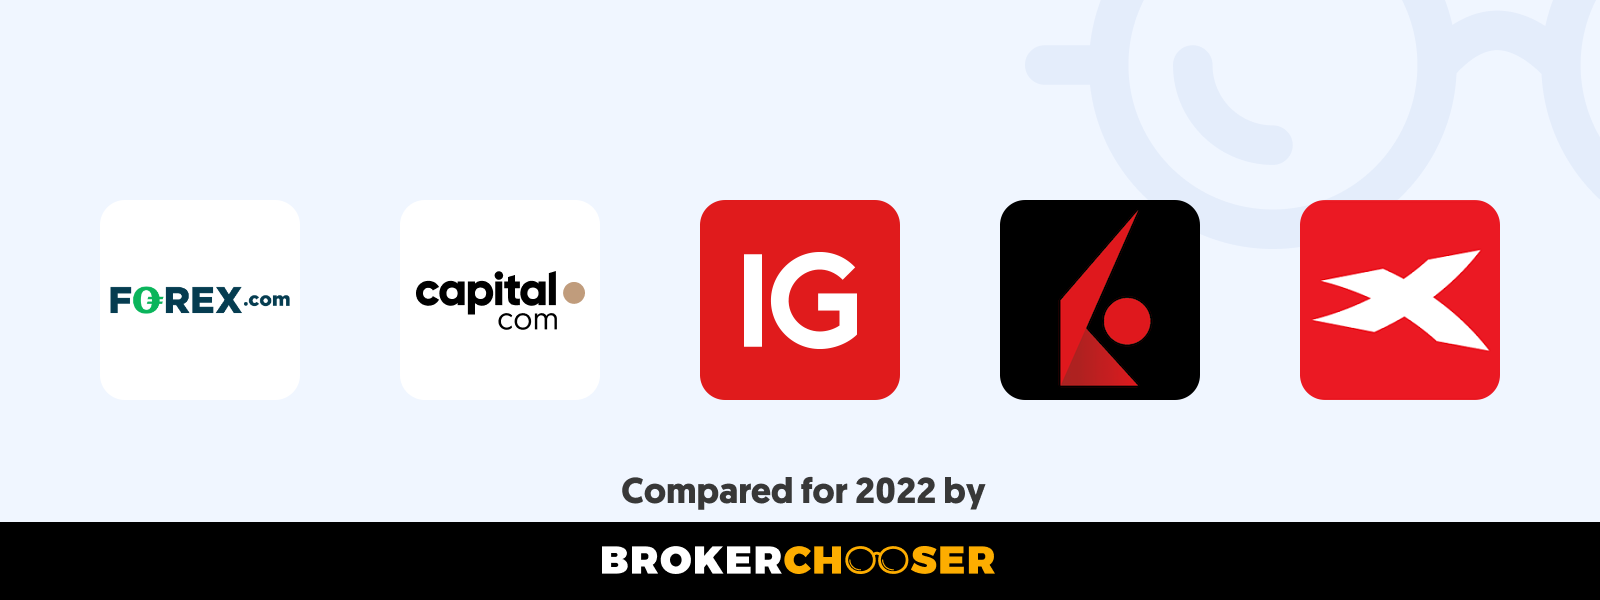 Best forex brokers for beginners in Fiji in 2021